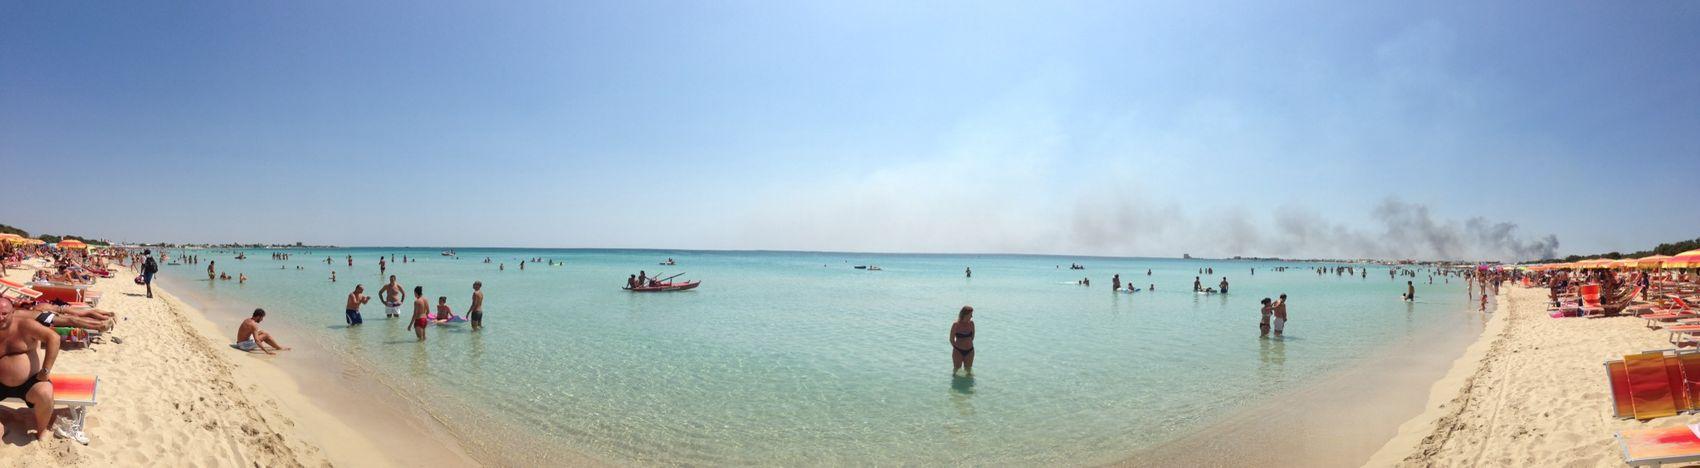 Hai detto mare? Italia #salento #portocesareo Panorama